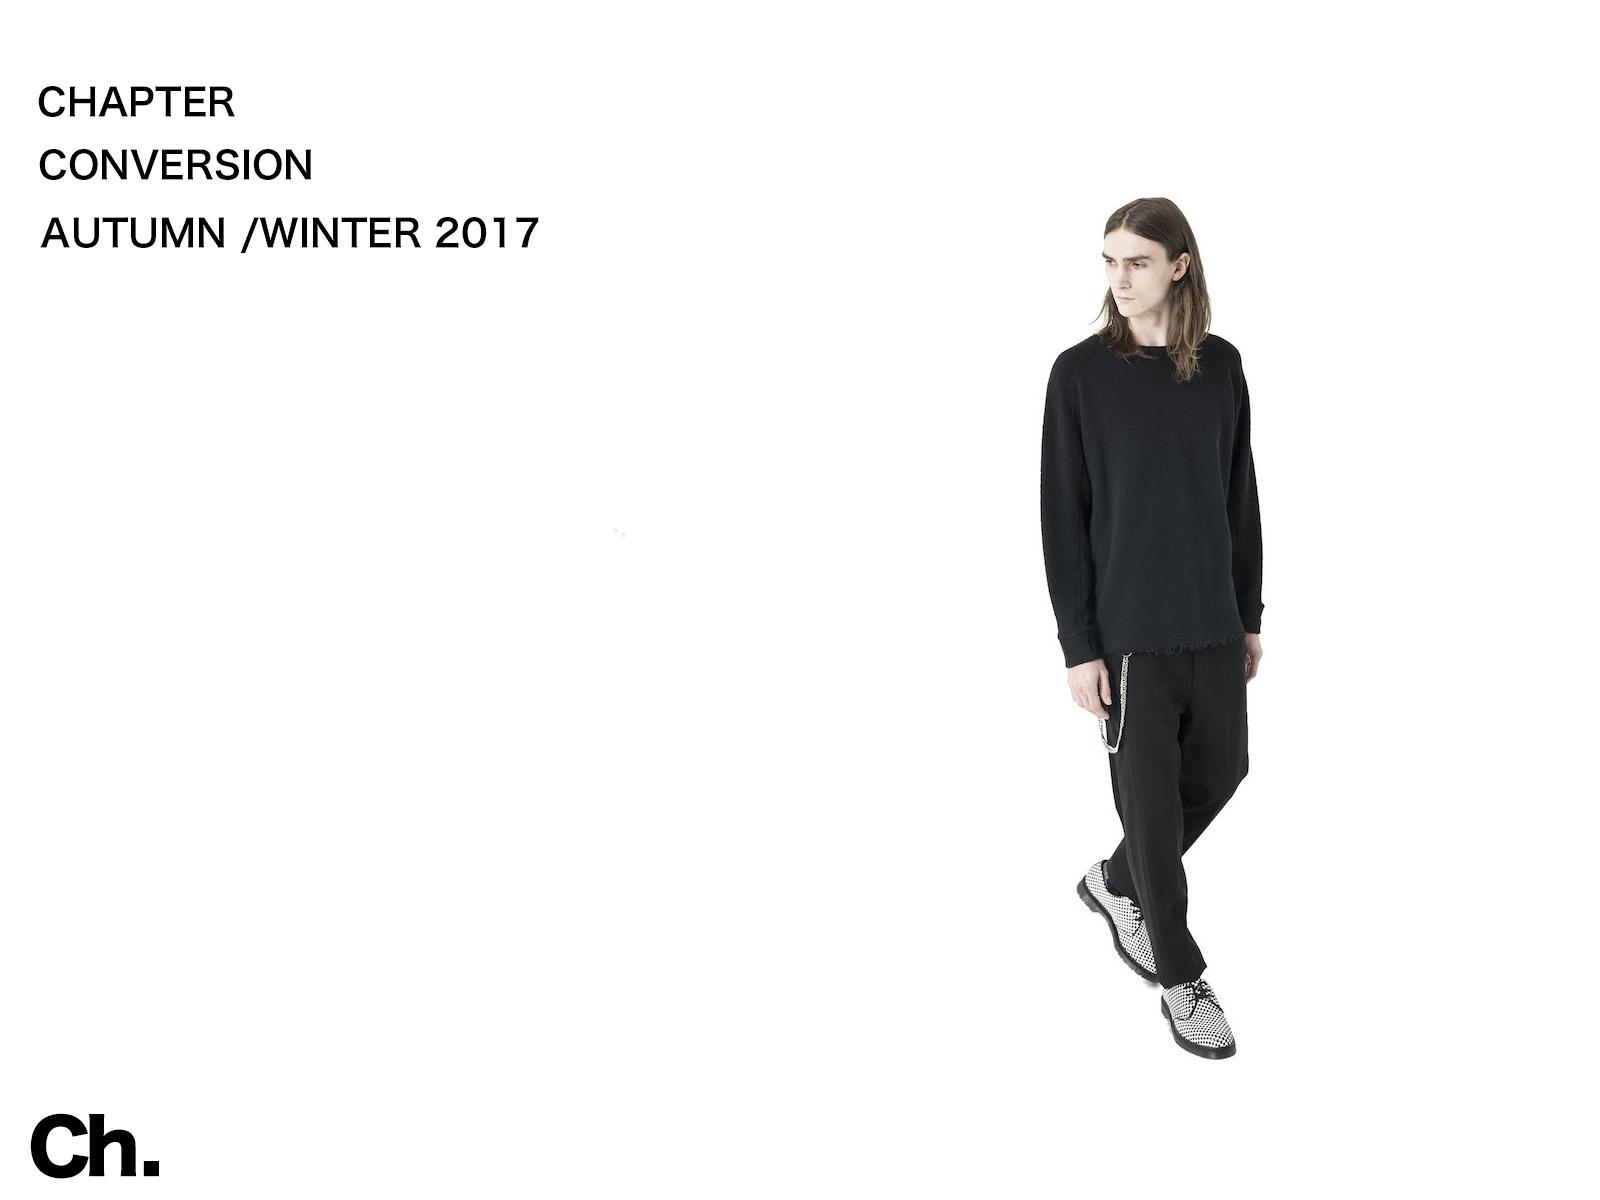 CHAPTER AUTUMN/WINTER 2017 オススメアイテム紹介